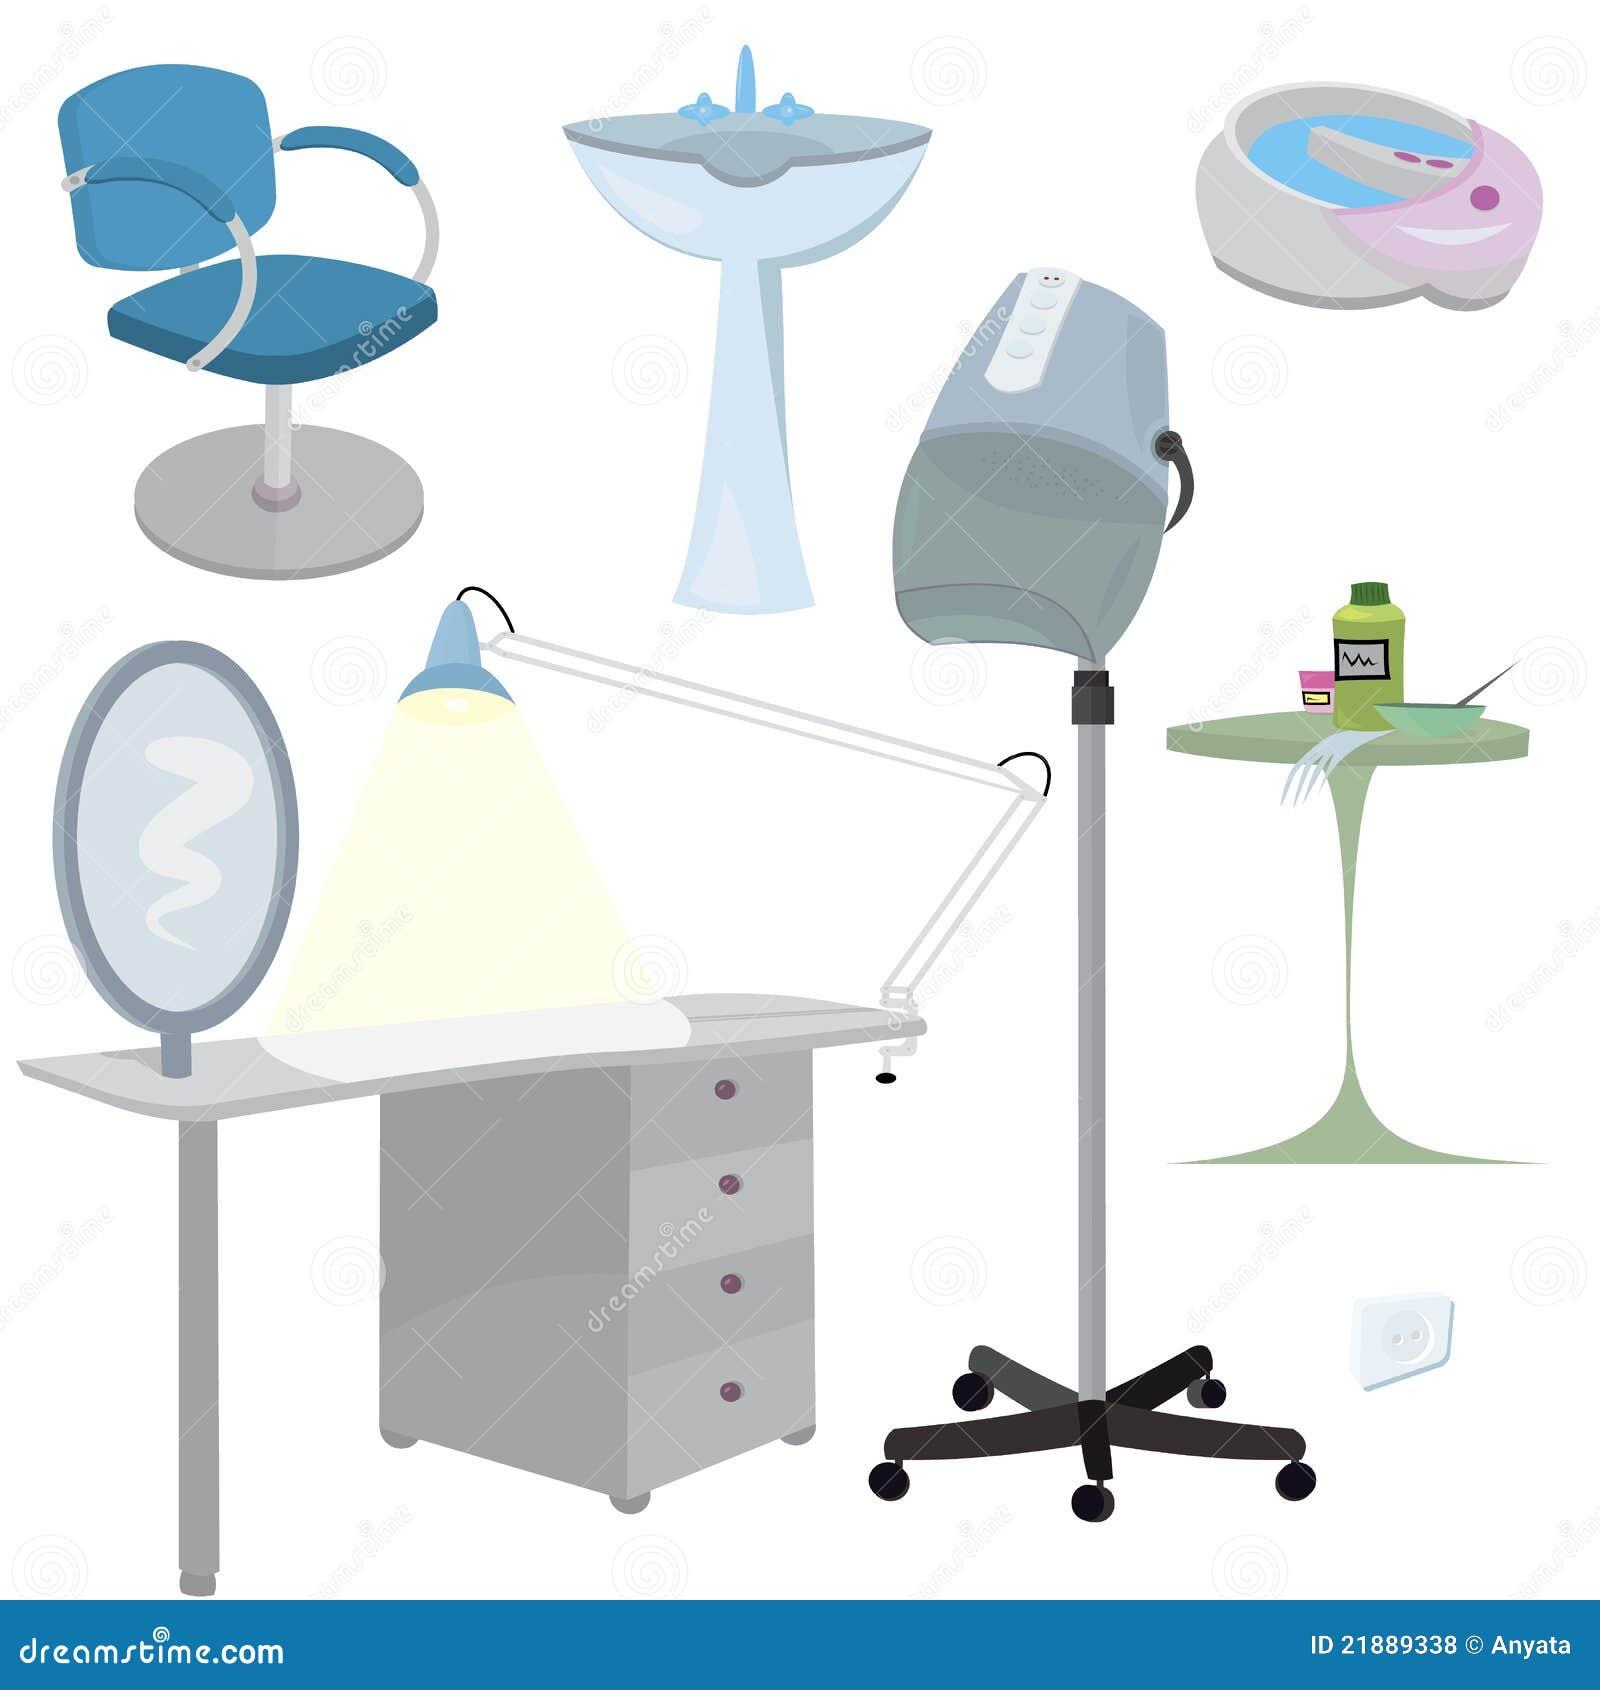 Fantastic Beauty Salon Furniture Icon Set Illustration 21889338 Megapixl Download Free Architecture Designs Intelgarnamadebymaigaardcom